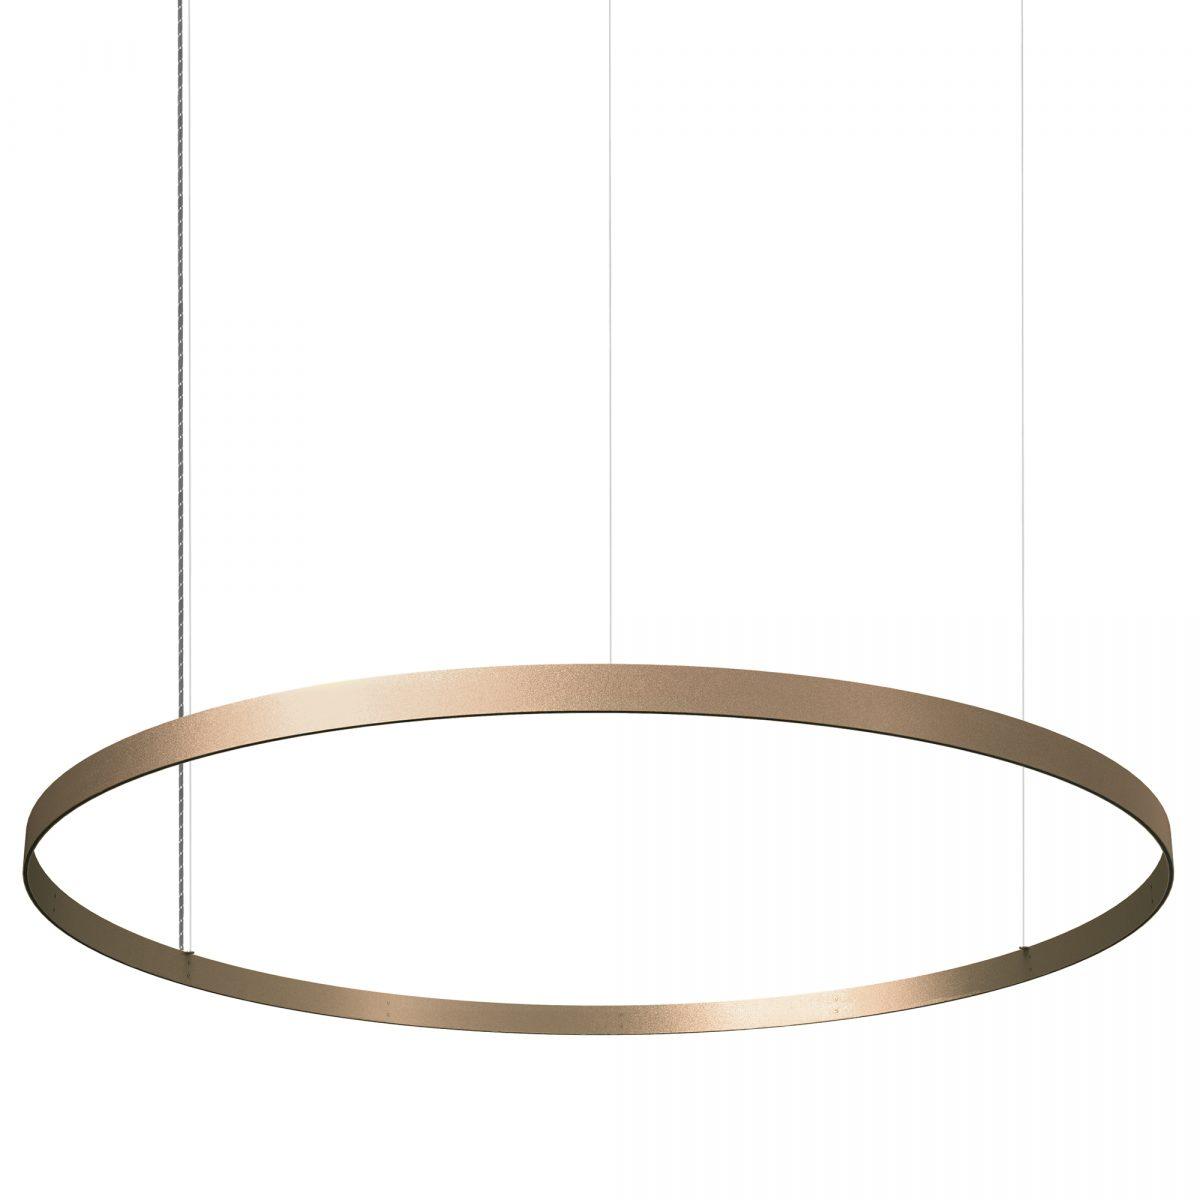 JSPR Eden M Bronze Off Elegant Design Lamp